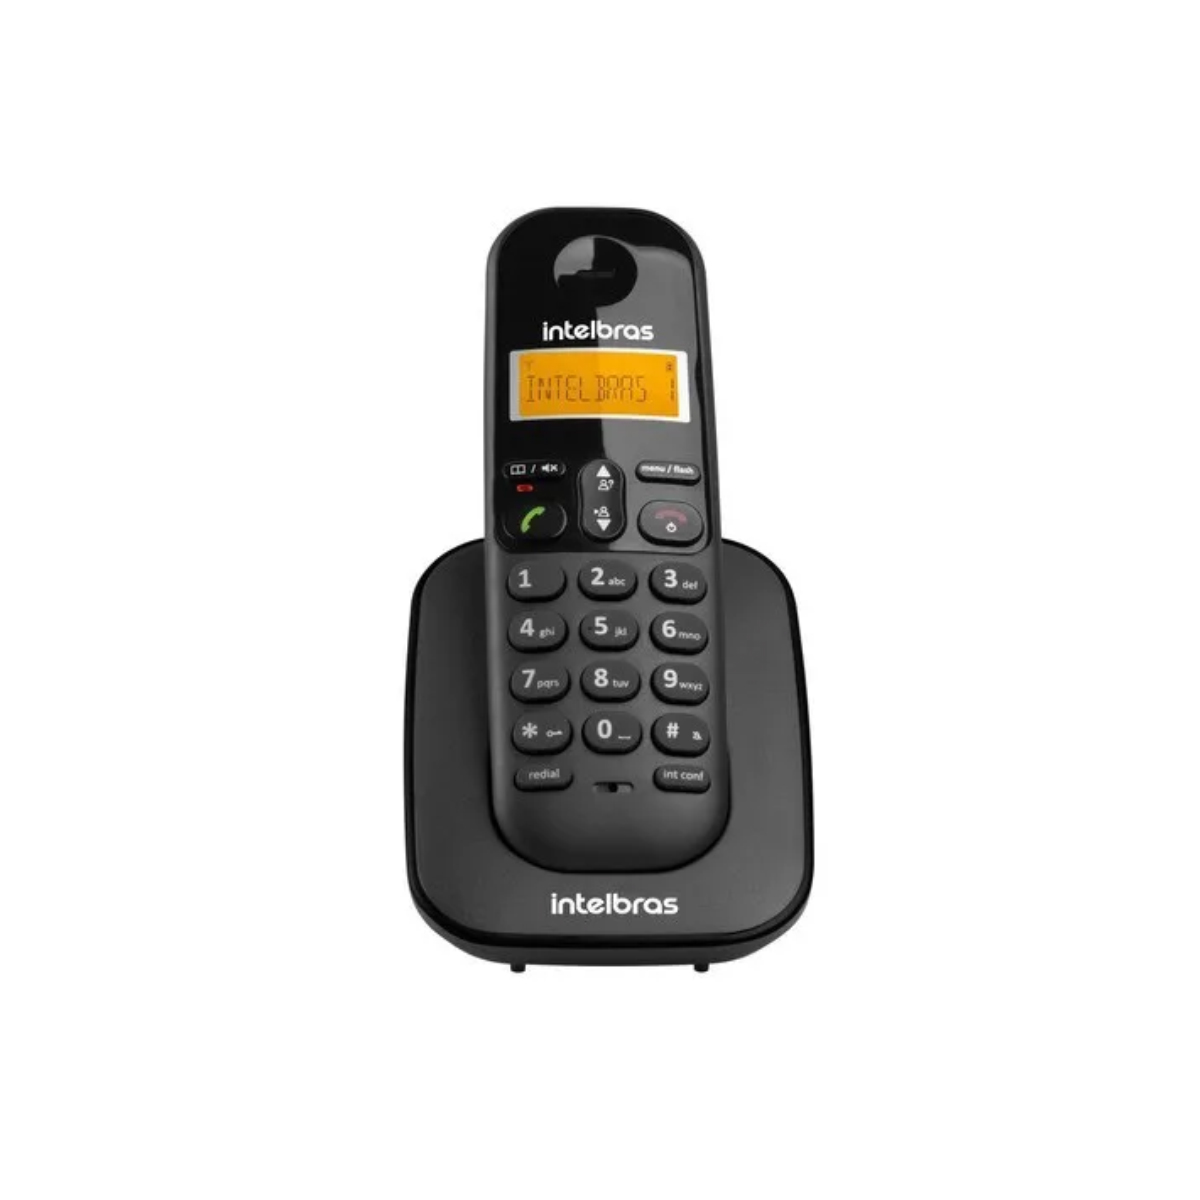 KIT TELEFONE INTELBRAS SEM FIO TS 3110 + 04 RAMAL TS 3111 PRETO